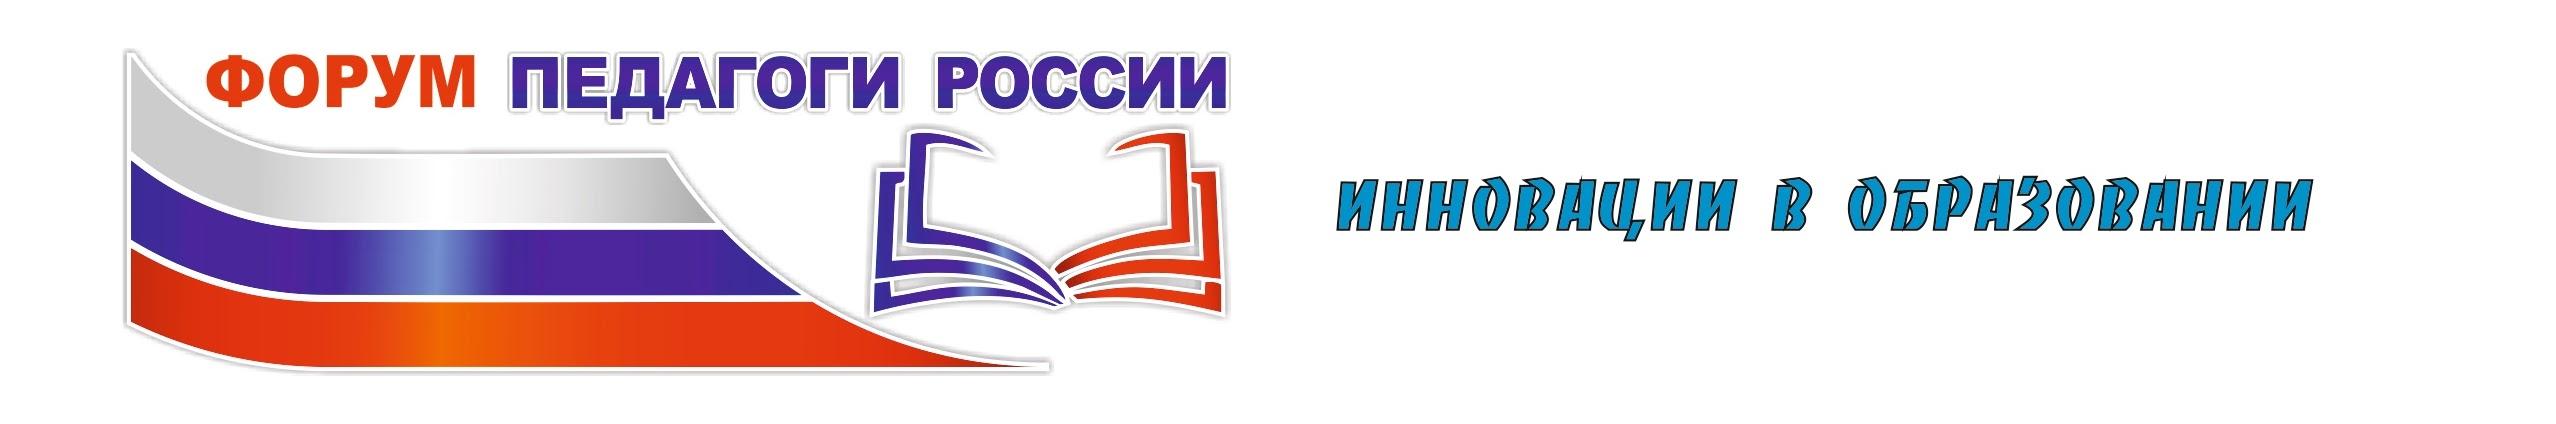 Педагогический онлайн марафон «Методист онлайн обучения: курсостроение»